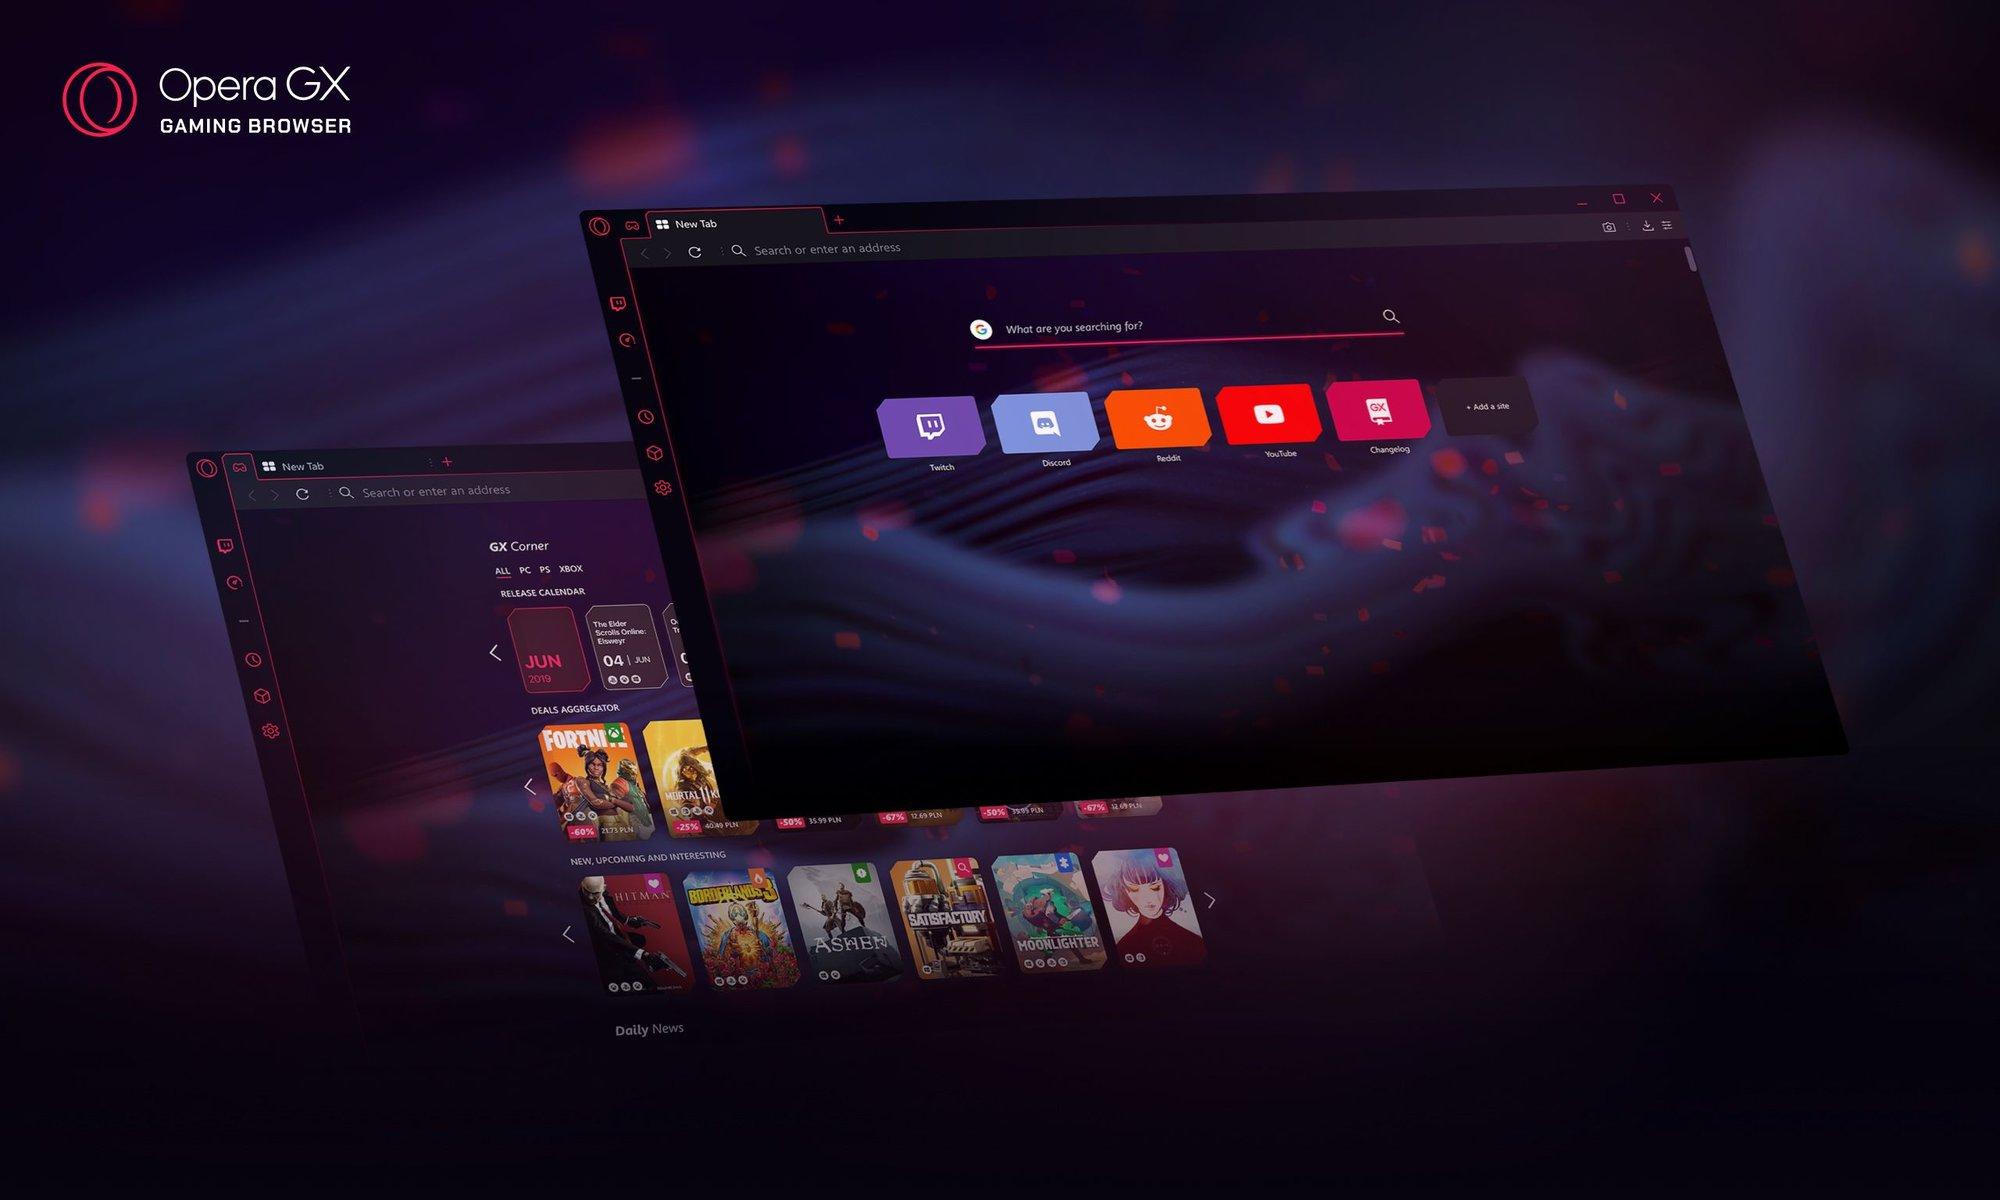 Opera gx o navegador gamer